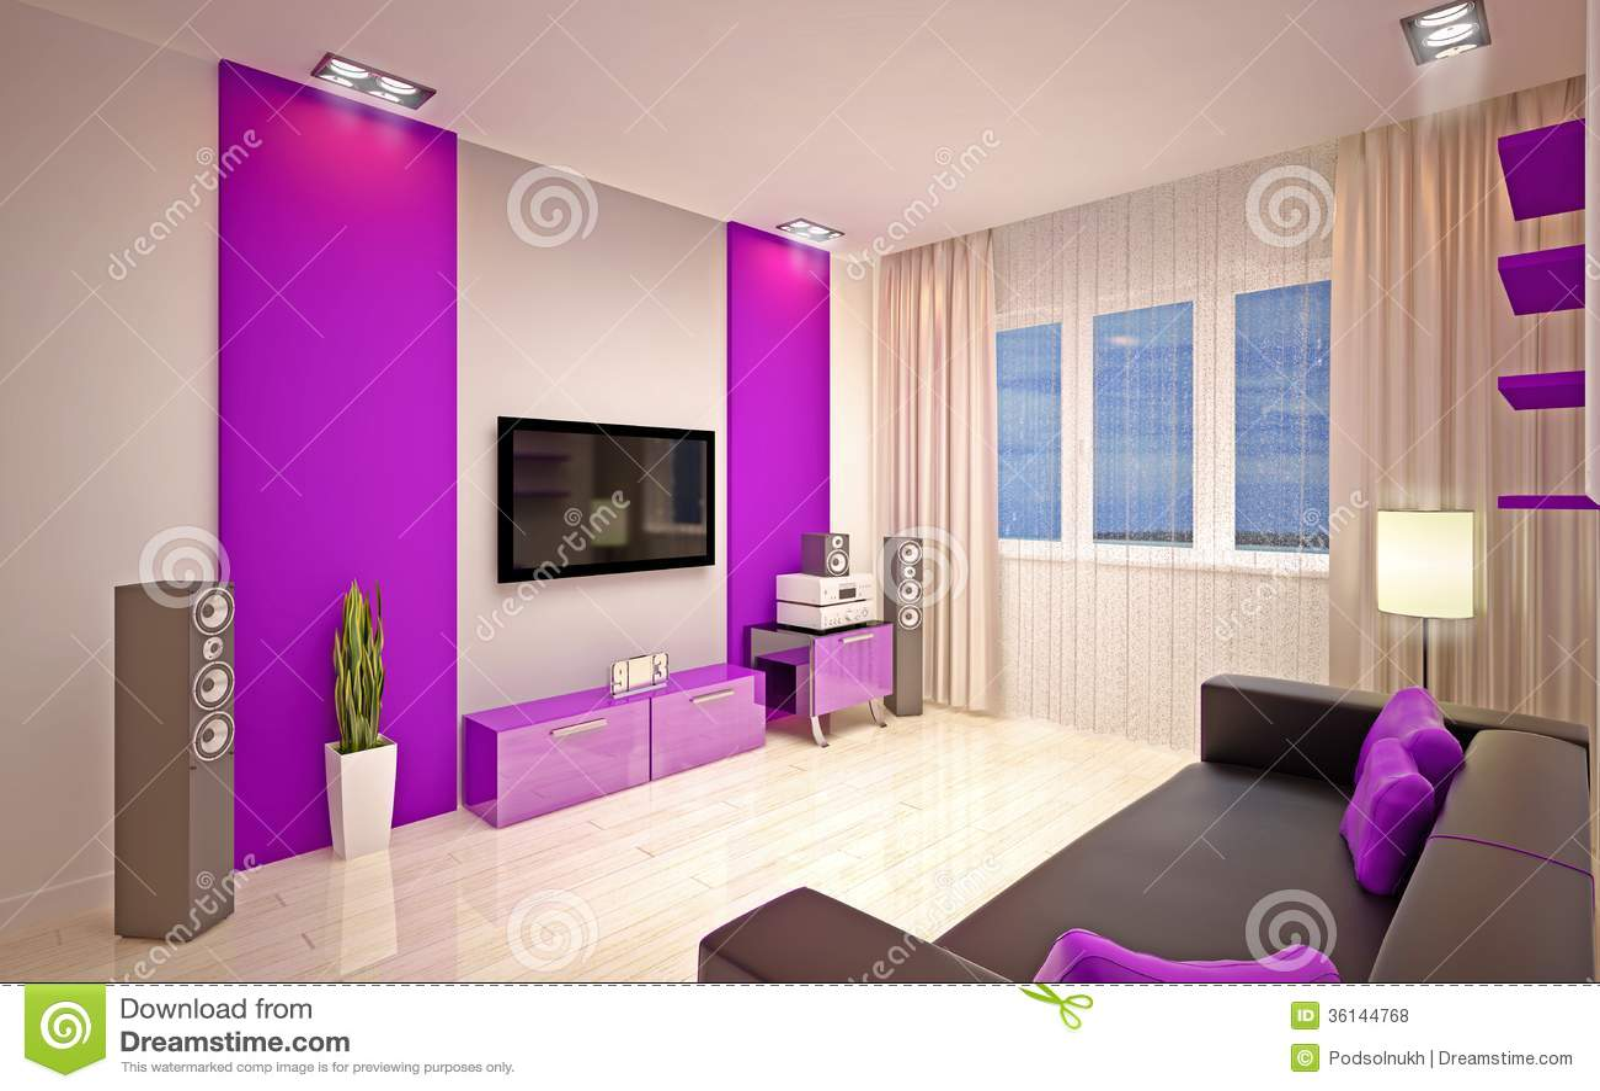 Interior design modern living room royalty free stock for Interior design bedroom purple